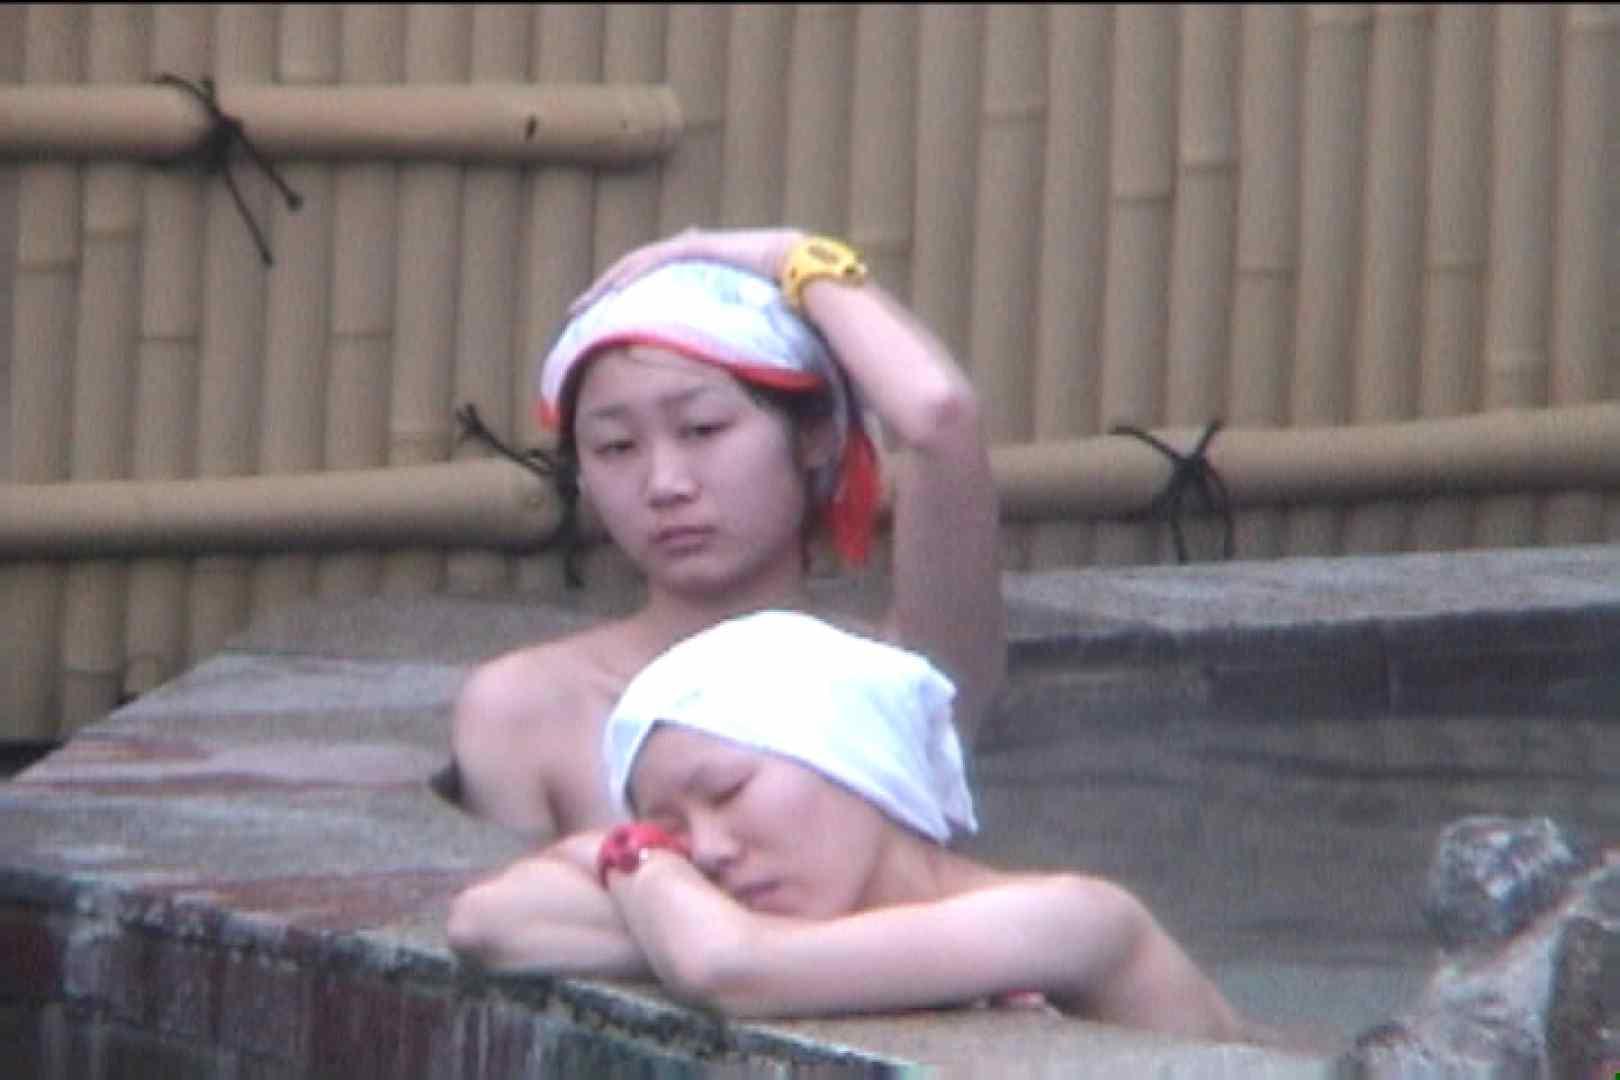 Aquaな露天風呂Vol.91【VIP限定】 盗撮シリーズ | 露天風呂編  99PIX 43